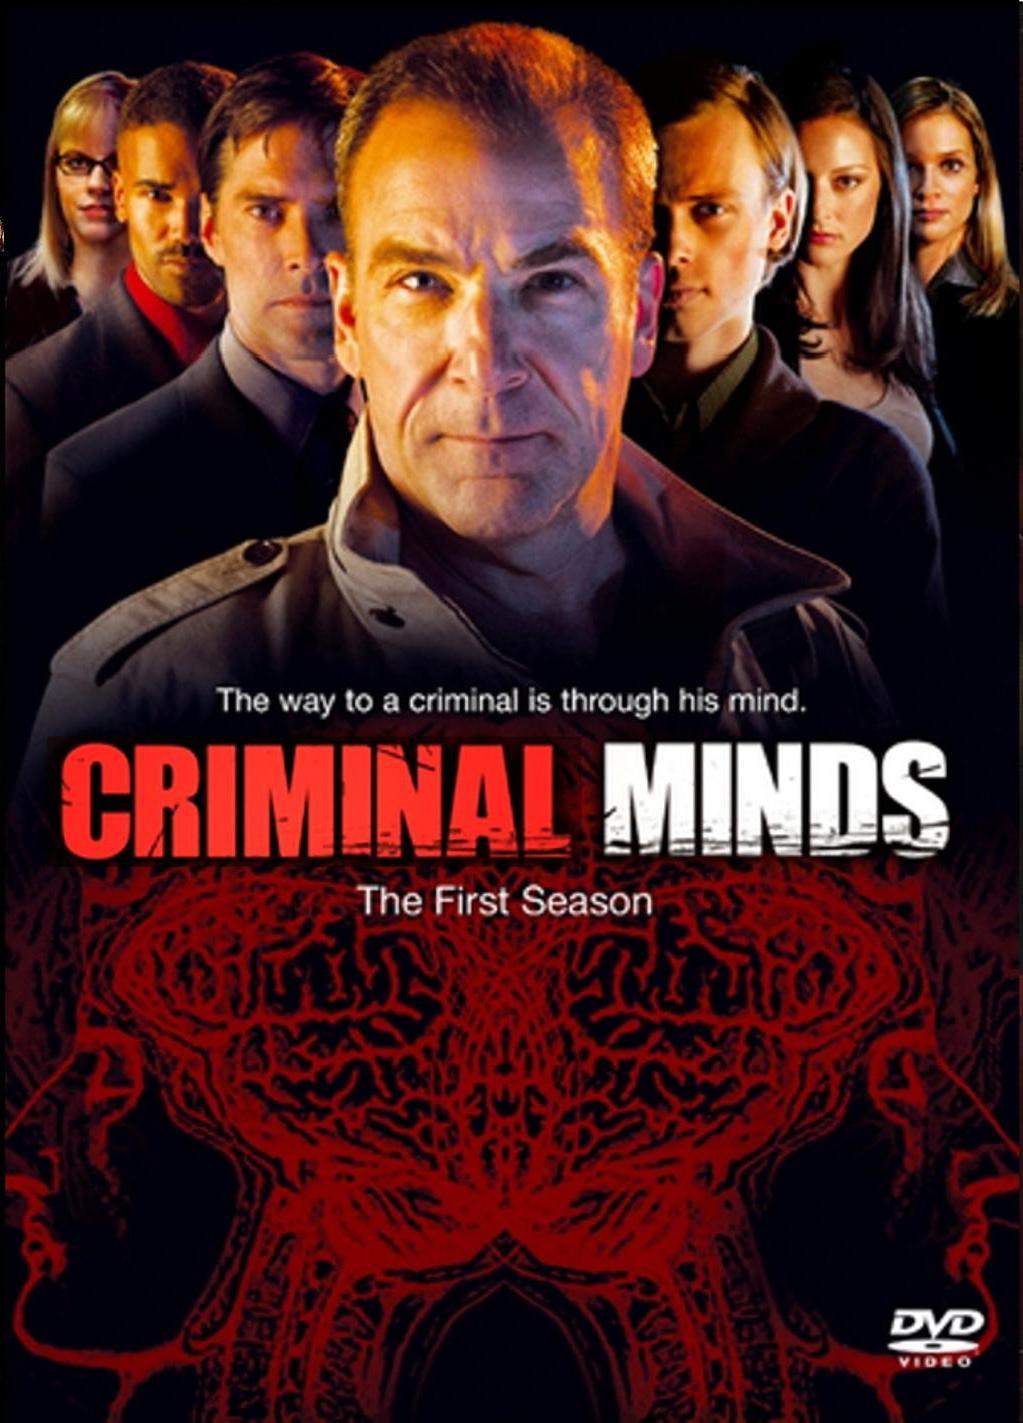 Download - Criminal Minds 2° Temporada Completa WEB-DL 480p Dual Audio